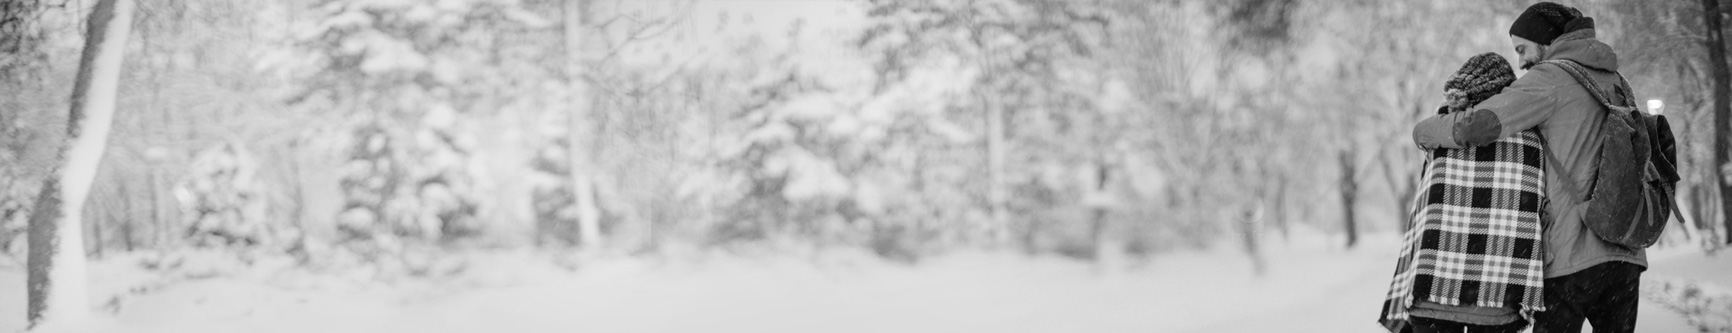 Heritage Winter Sport Merino Banner